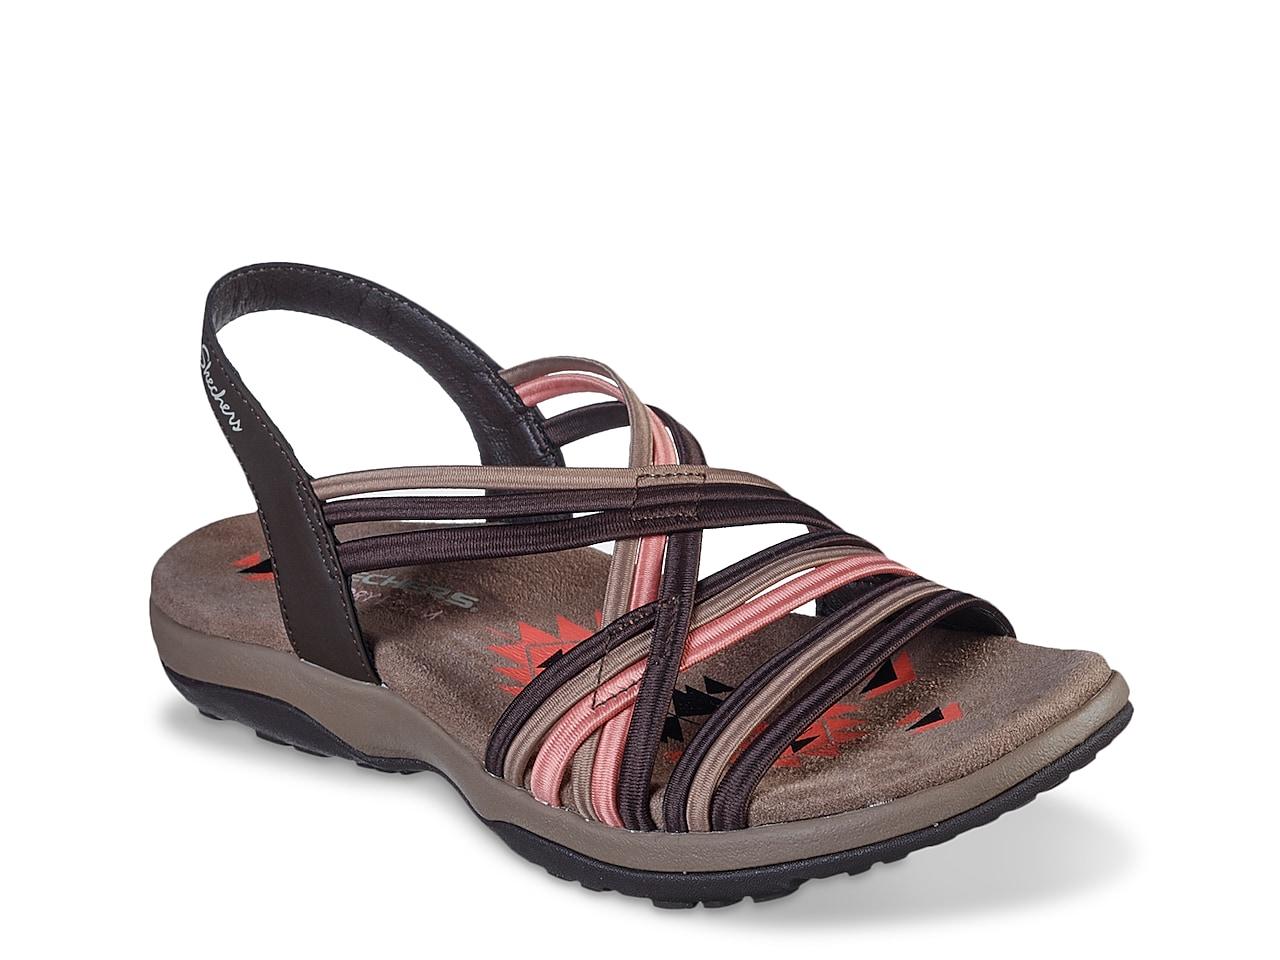 Skechers Reggae Slim Simply Stretch Sandal